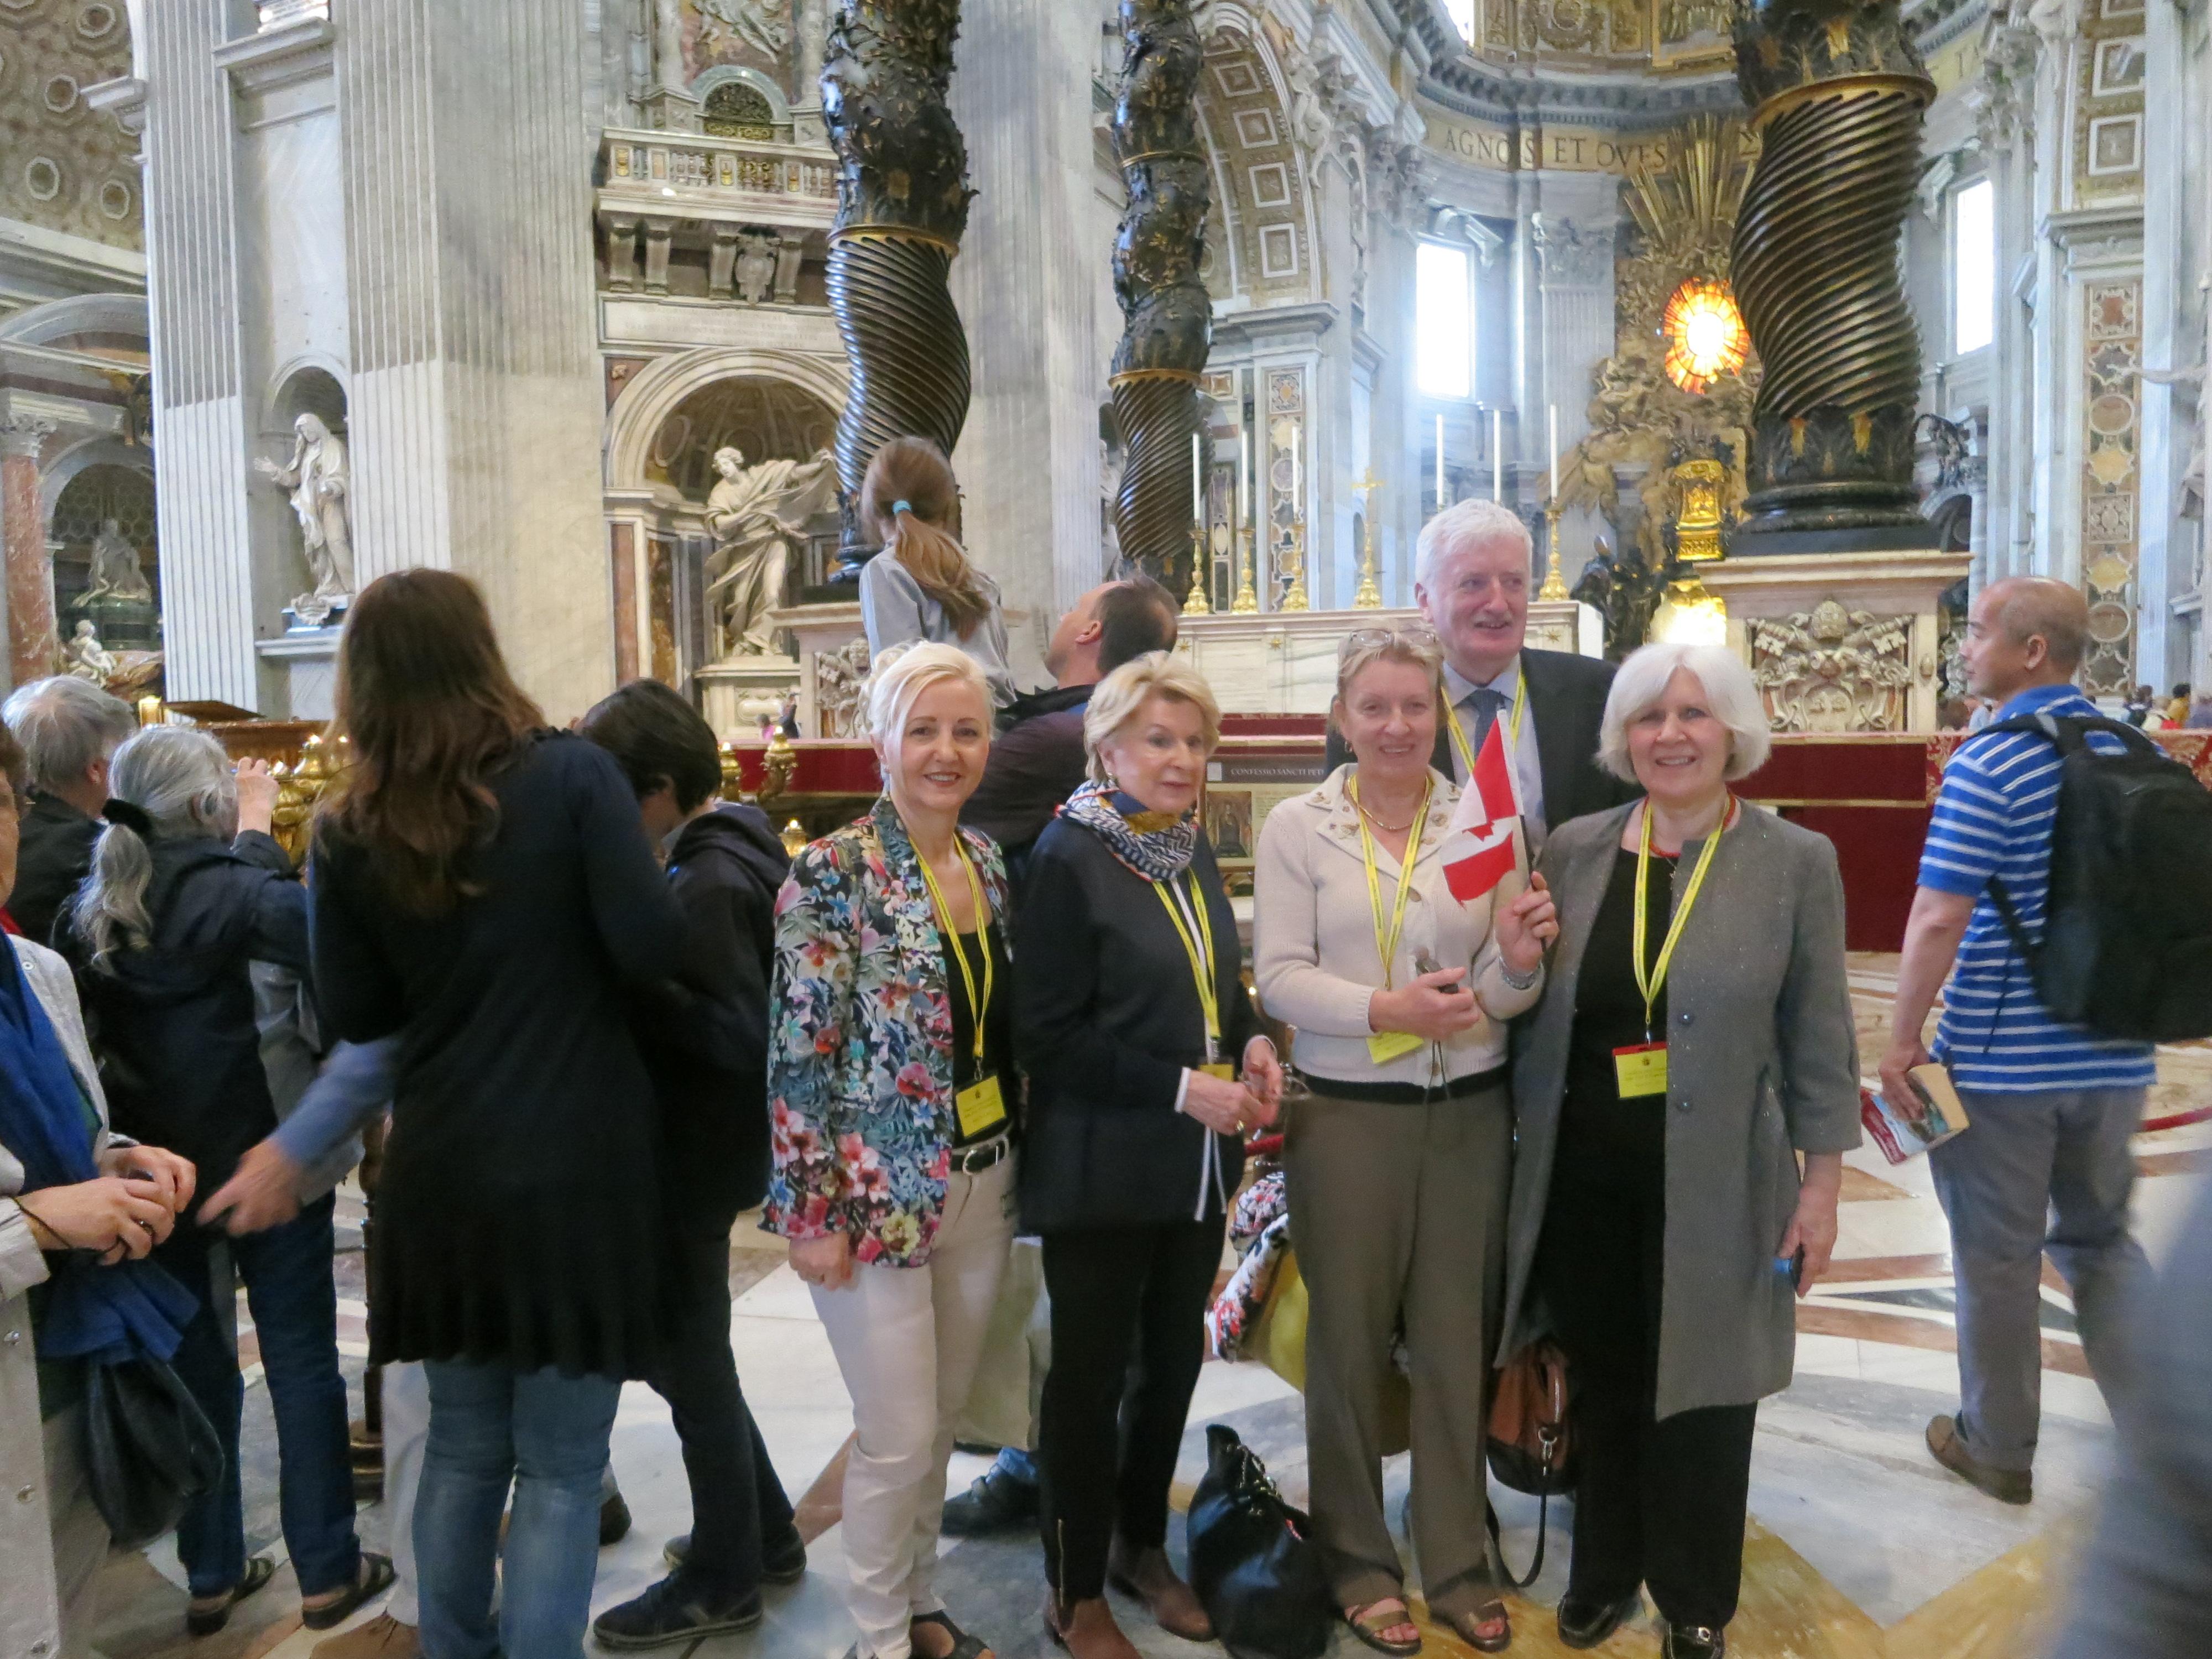 St.Peters Basilica